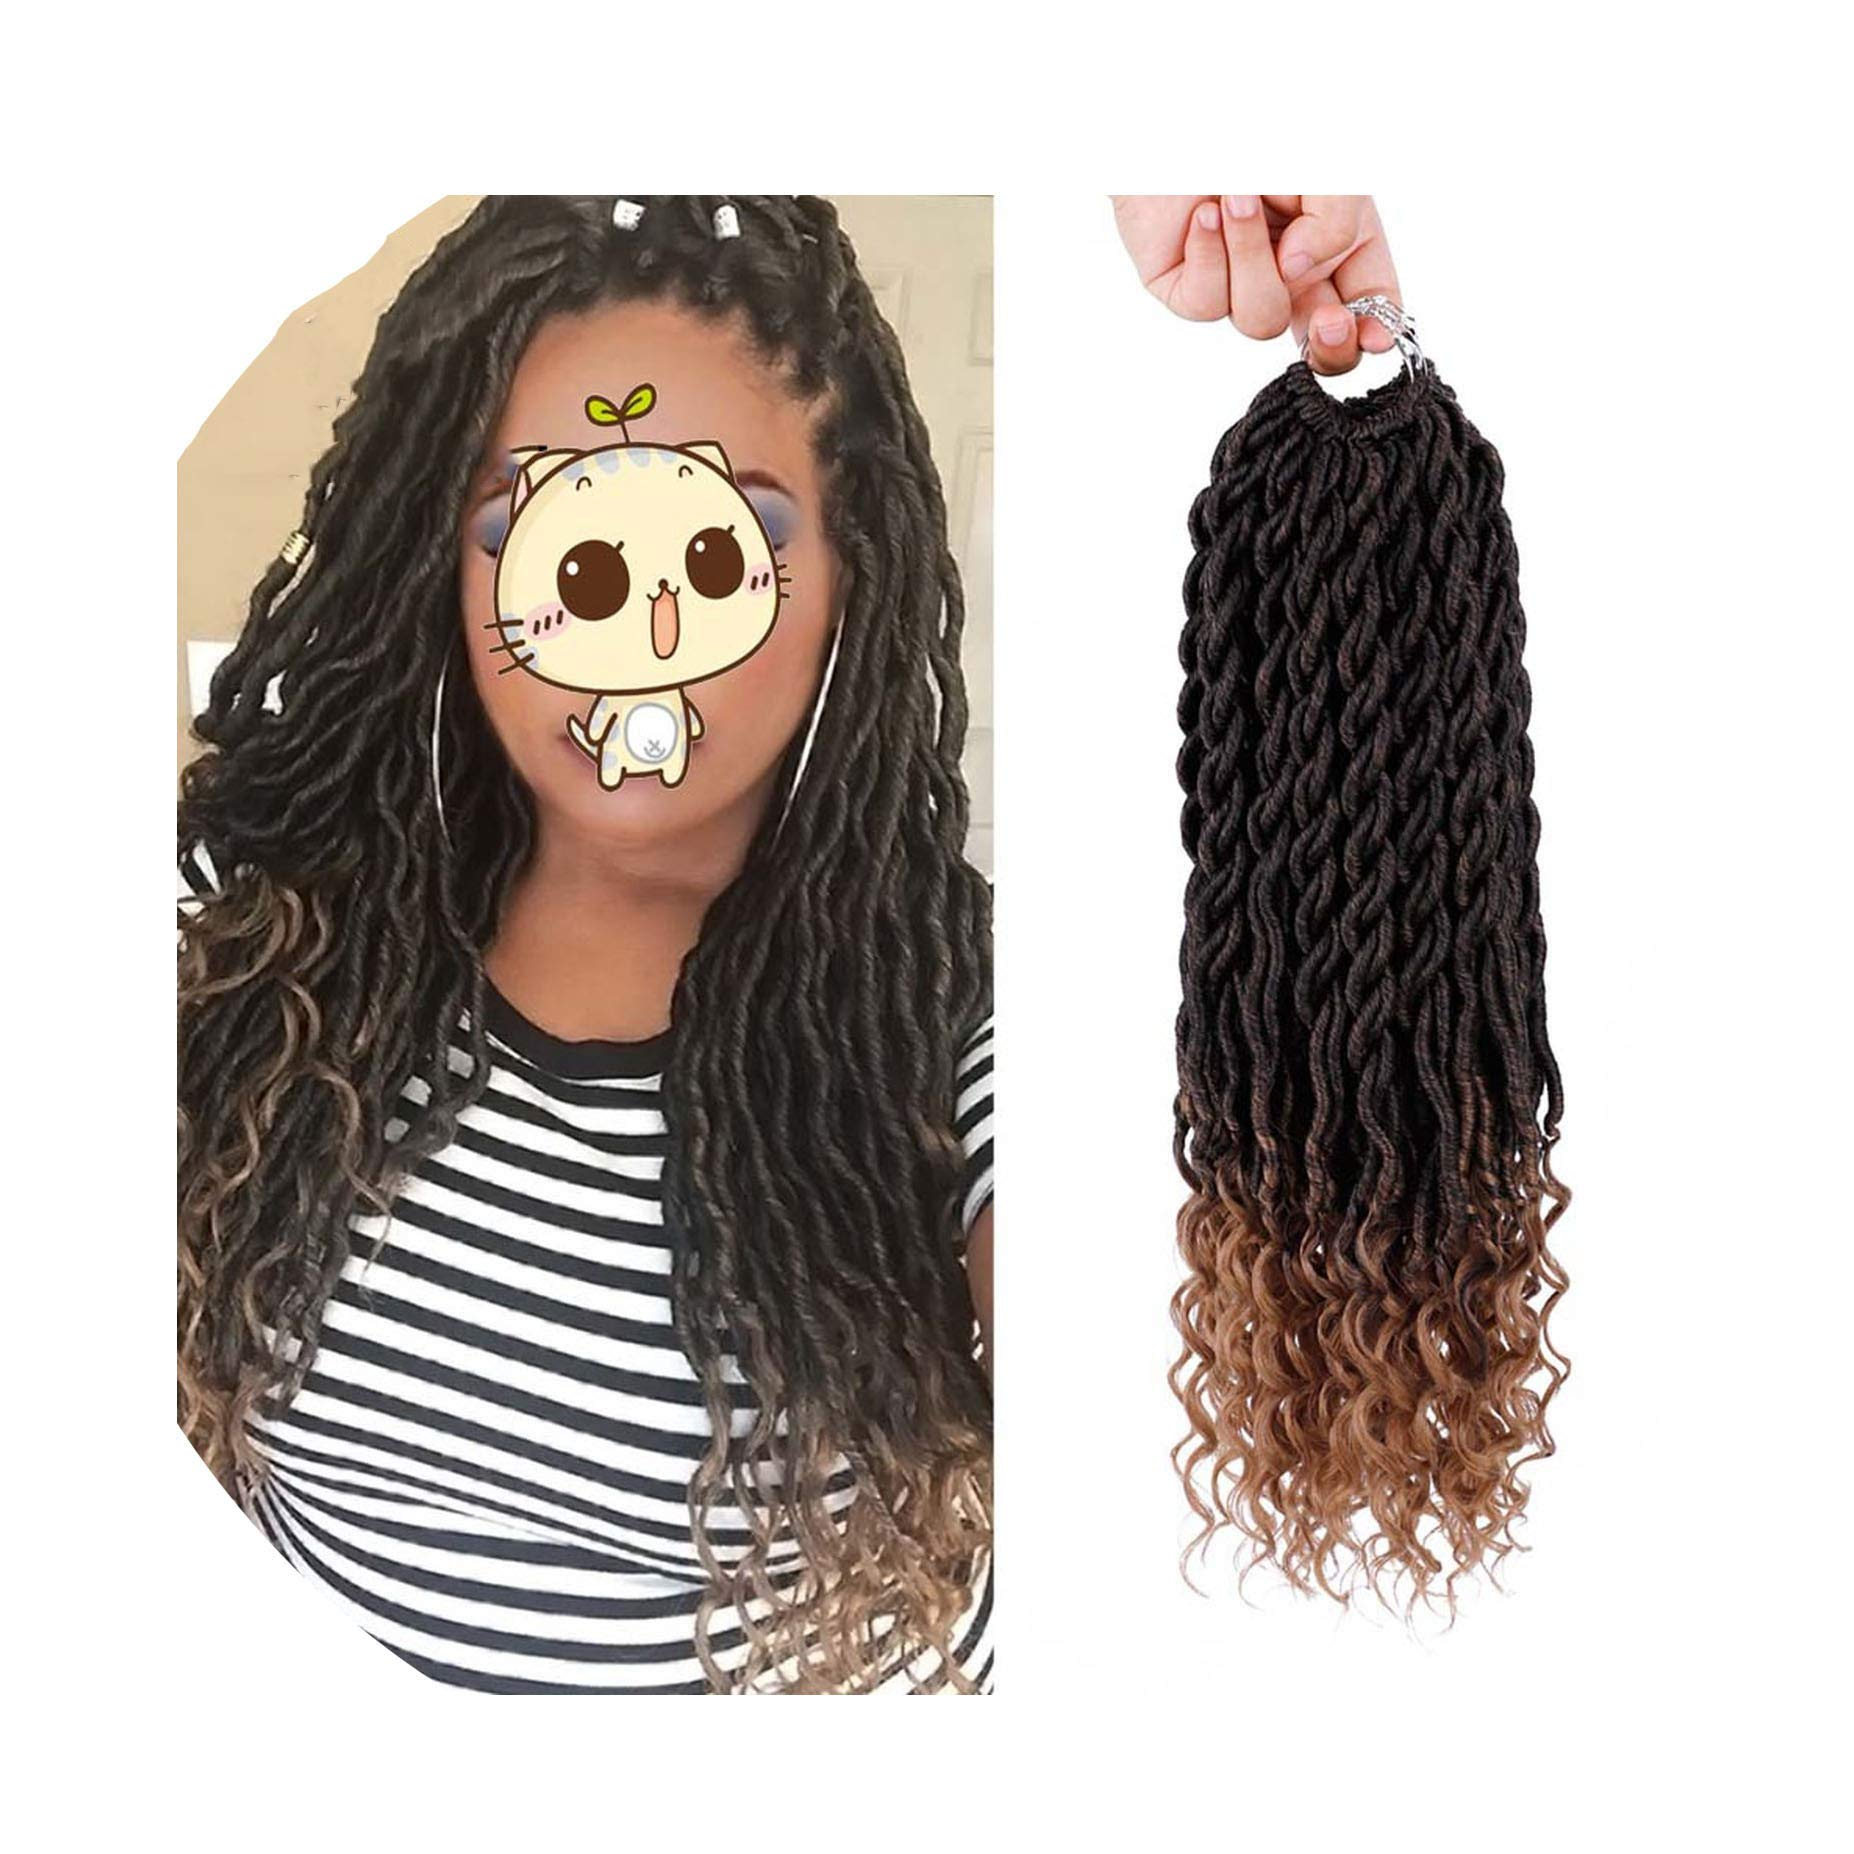 Bohemian Faux Locs Curly Crochet Braids Braiding Hair Bulk Crochet Hair Extensions Synthetic Hair,T1B/27,18inches,7Pcs by Ting room